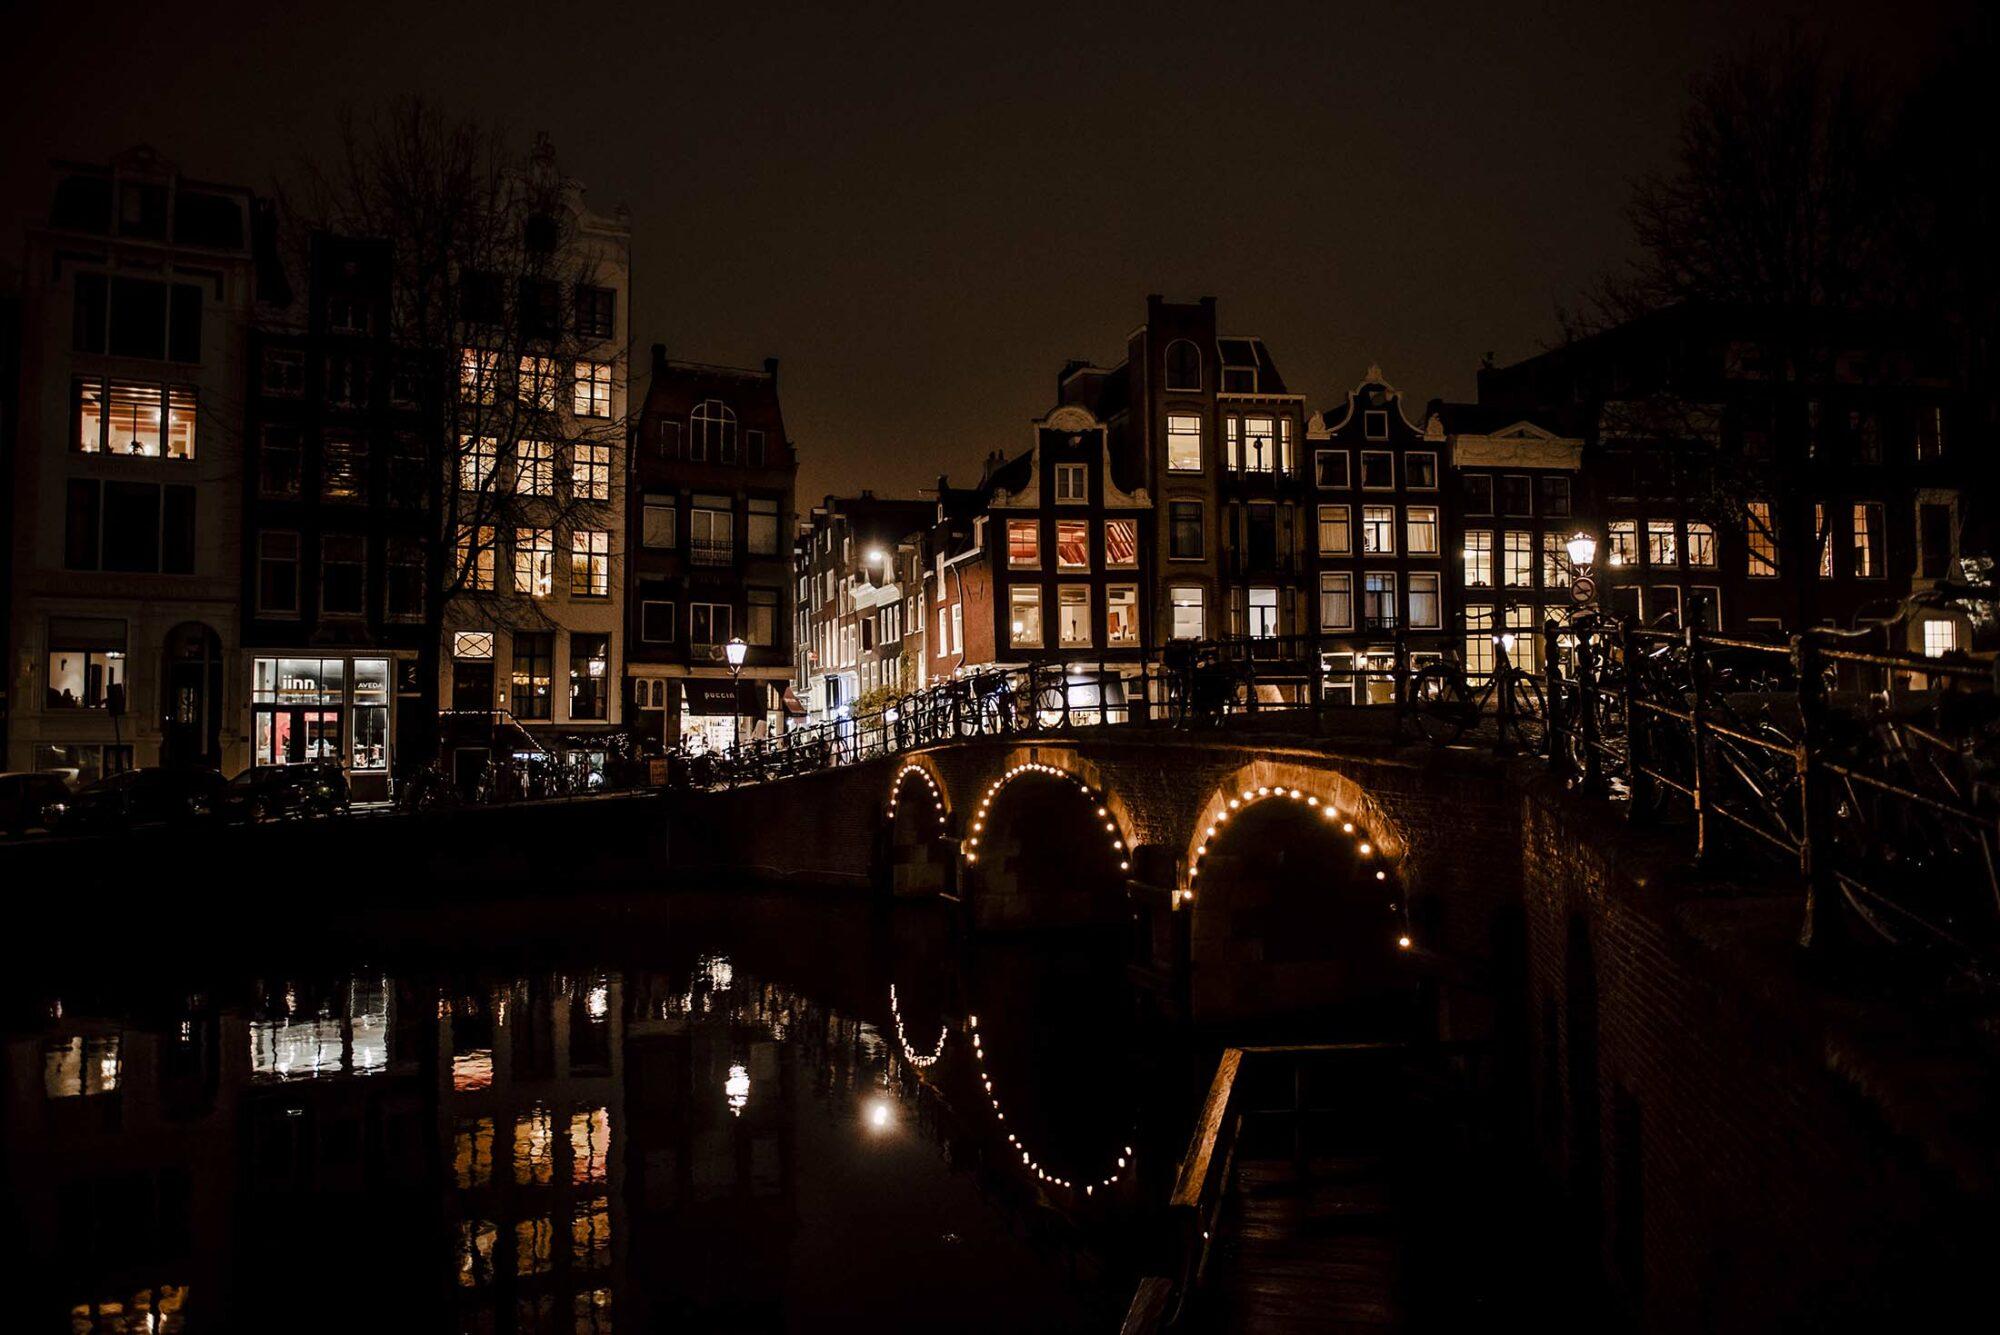 Fotoworkshop Amsterdam - ROCKY ROADS TRAVEL